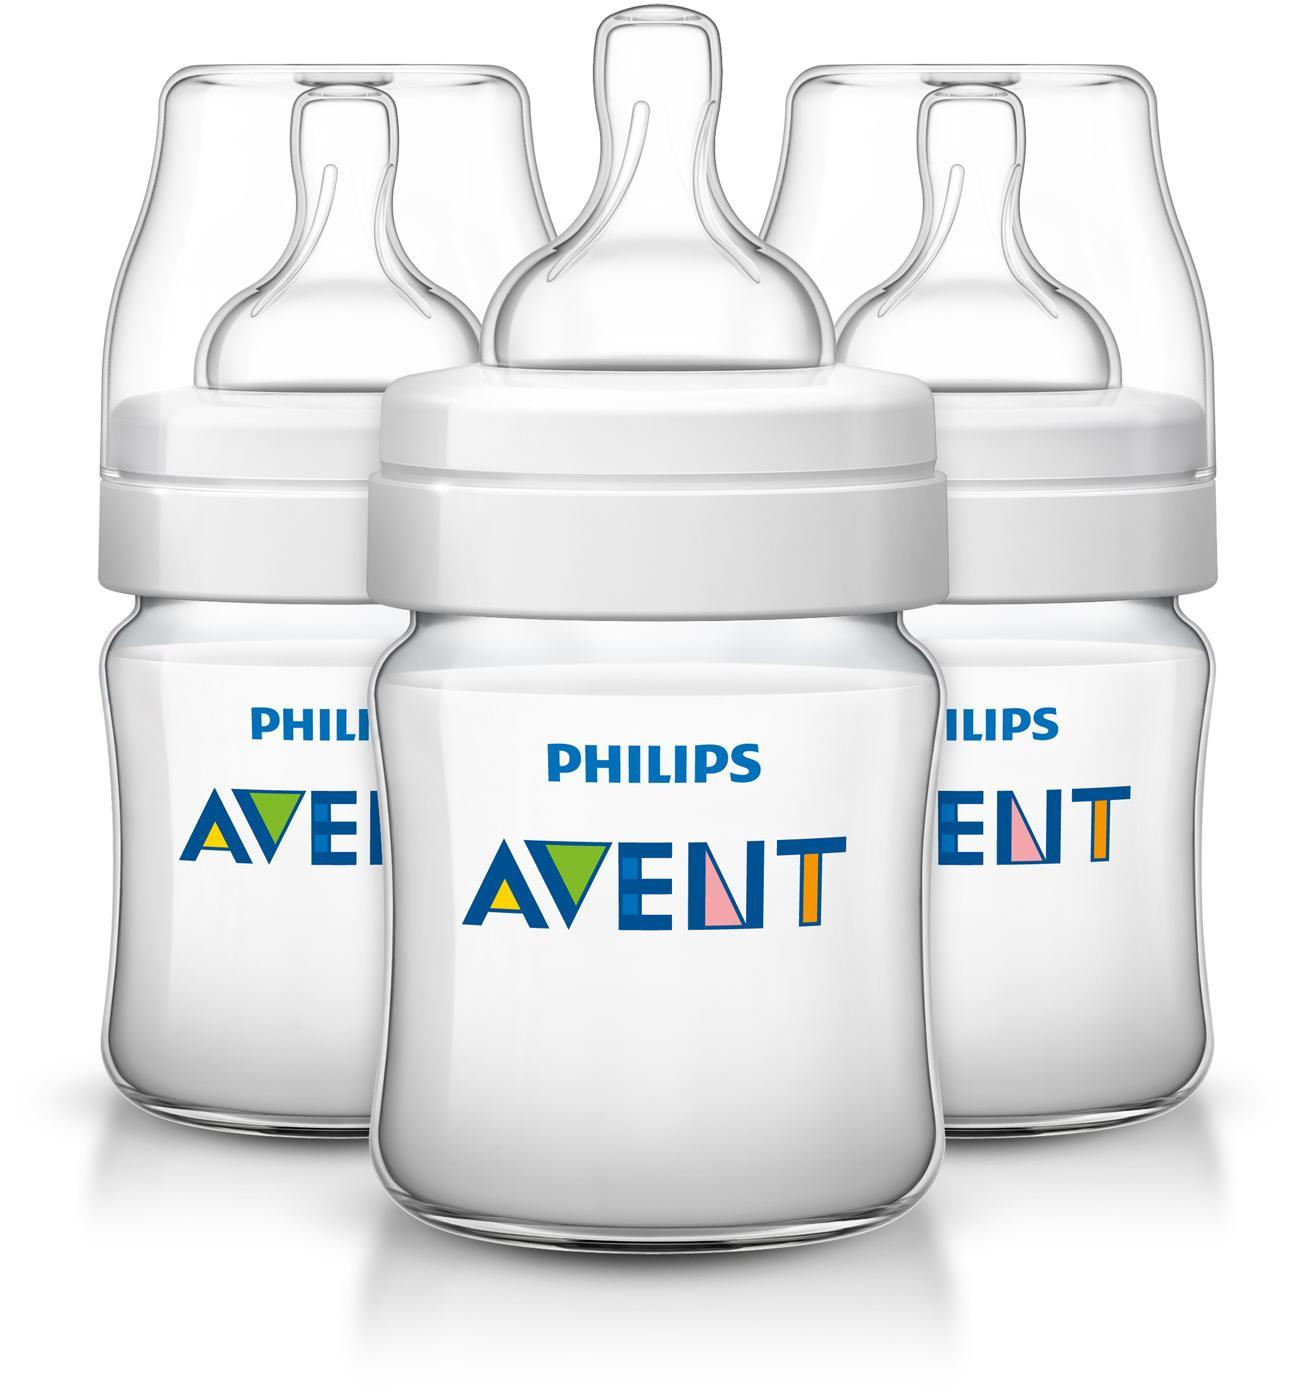 philips avent bottle warmer instructions scf355